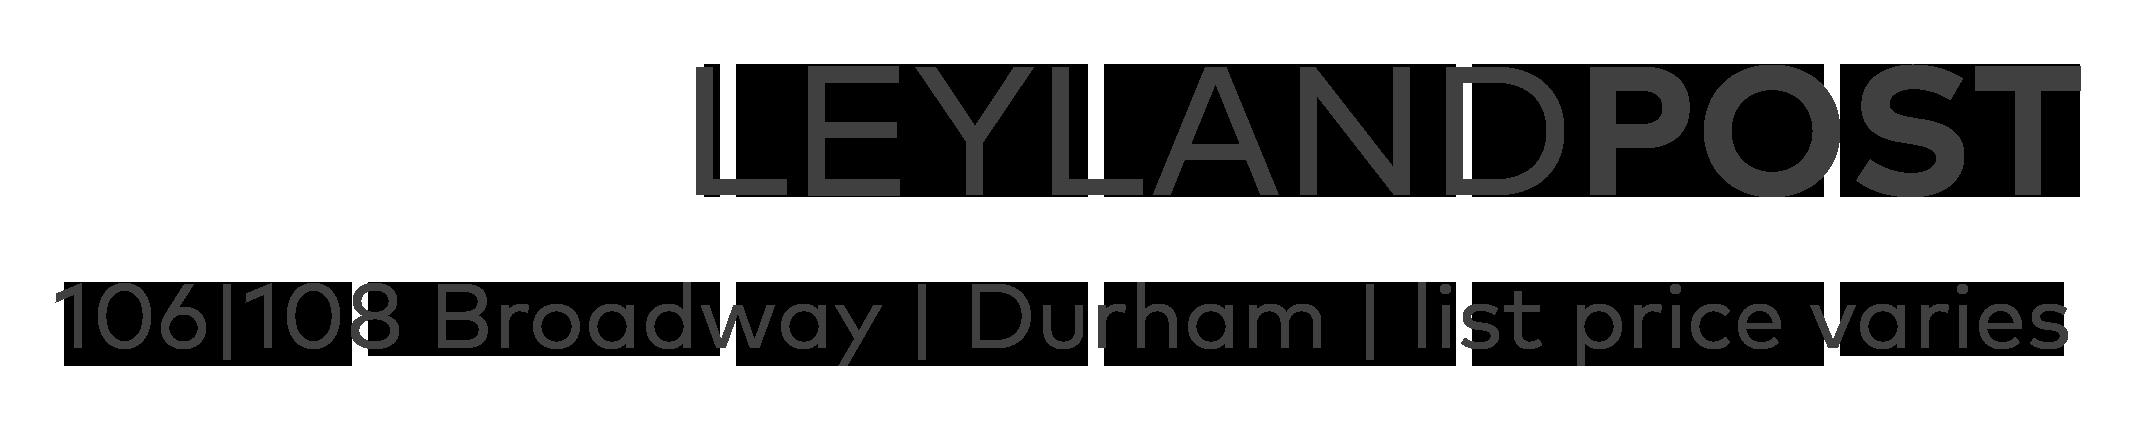 Leyland Post Luxury Condos, Durham NC